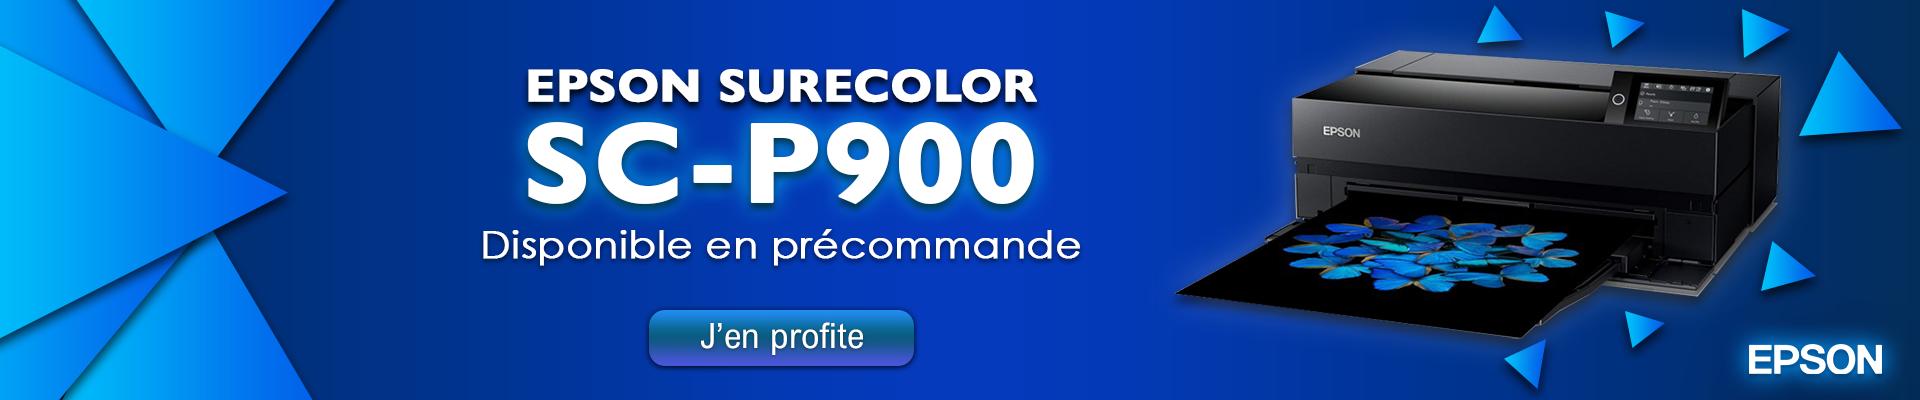 5535638-1616080059